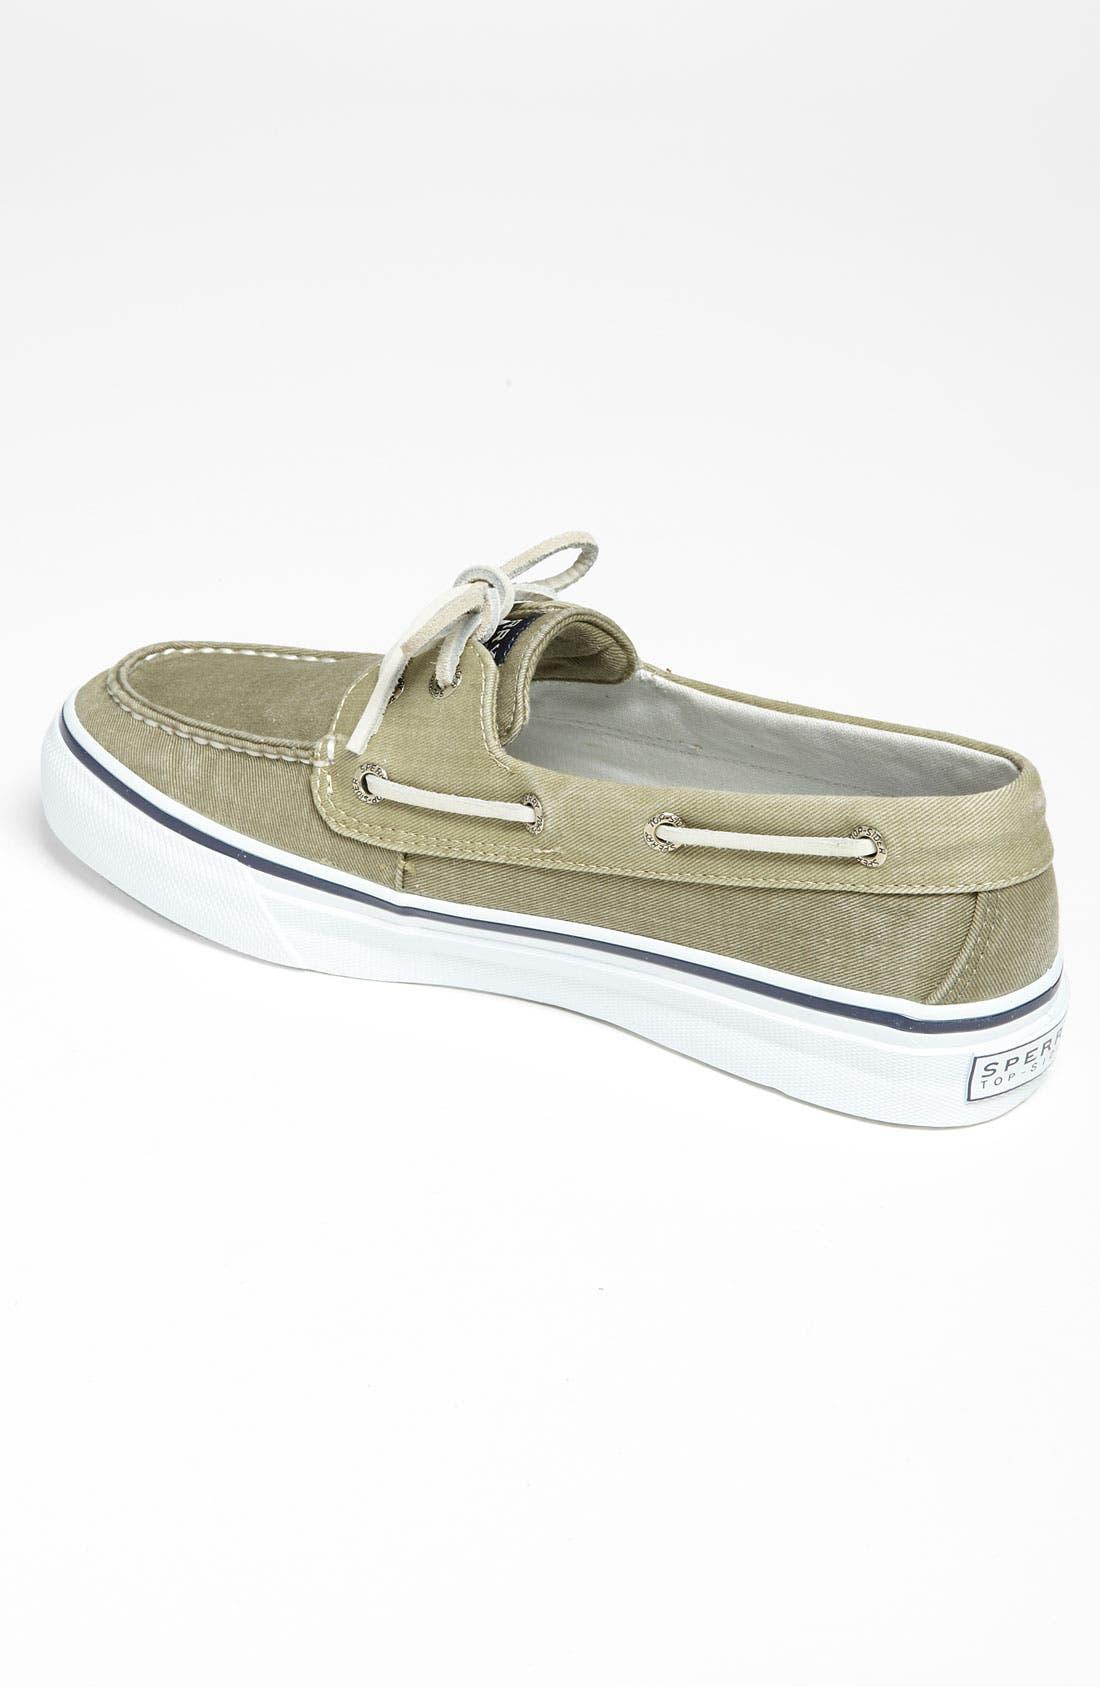 Top-Sider<sup>®</sup> 'Bahama' Boat Shoe,                             Alternate thumbnail 5, color,                             246